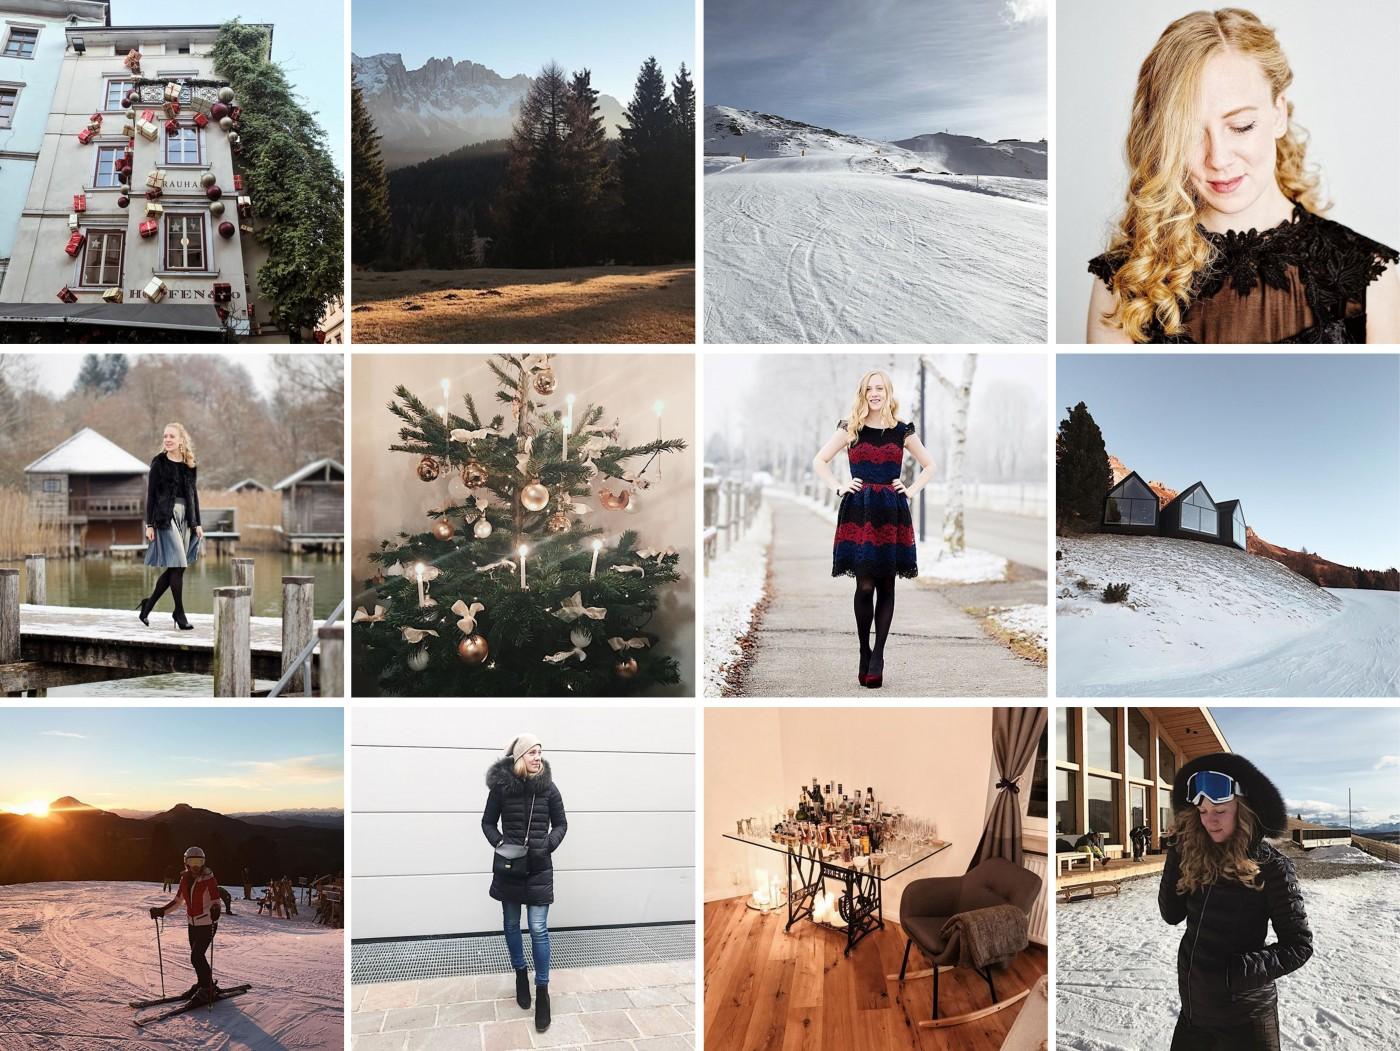 instagram review december thegoldenbun the golden bun monthly favorites november, Life on my phone | München Modeblog, German Fashion Blog, Fashionblogger, new trends